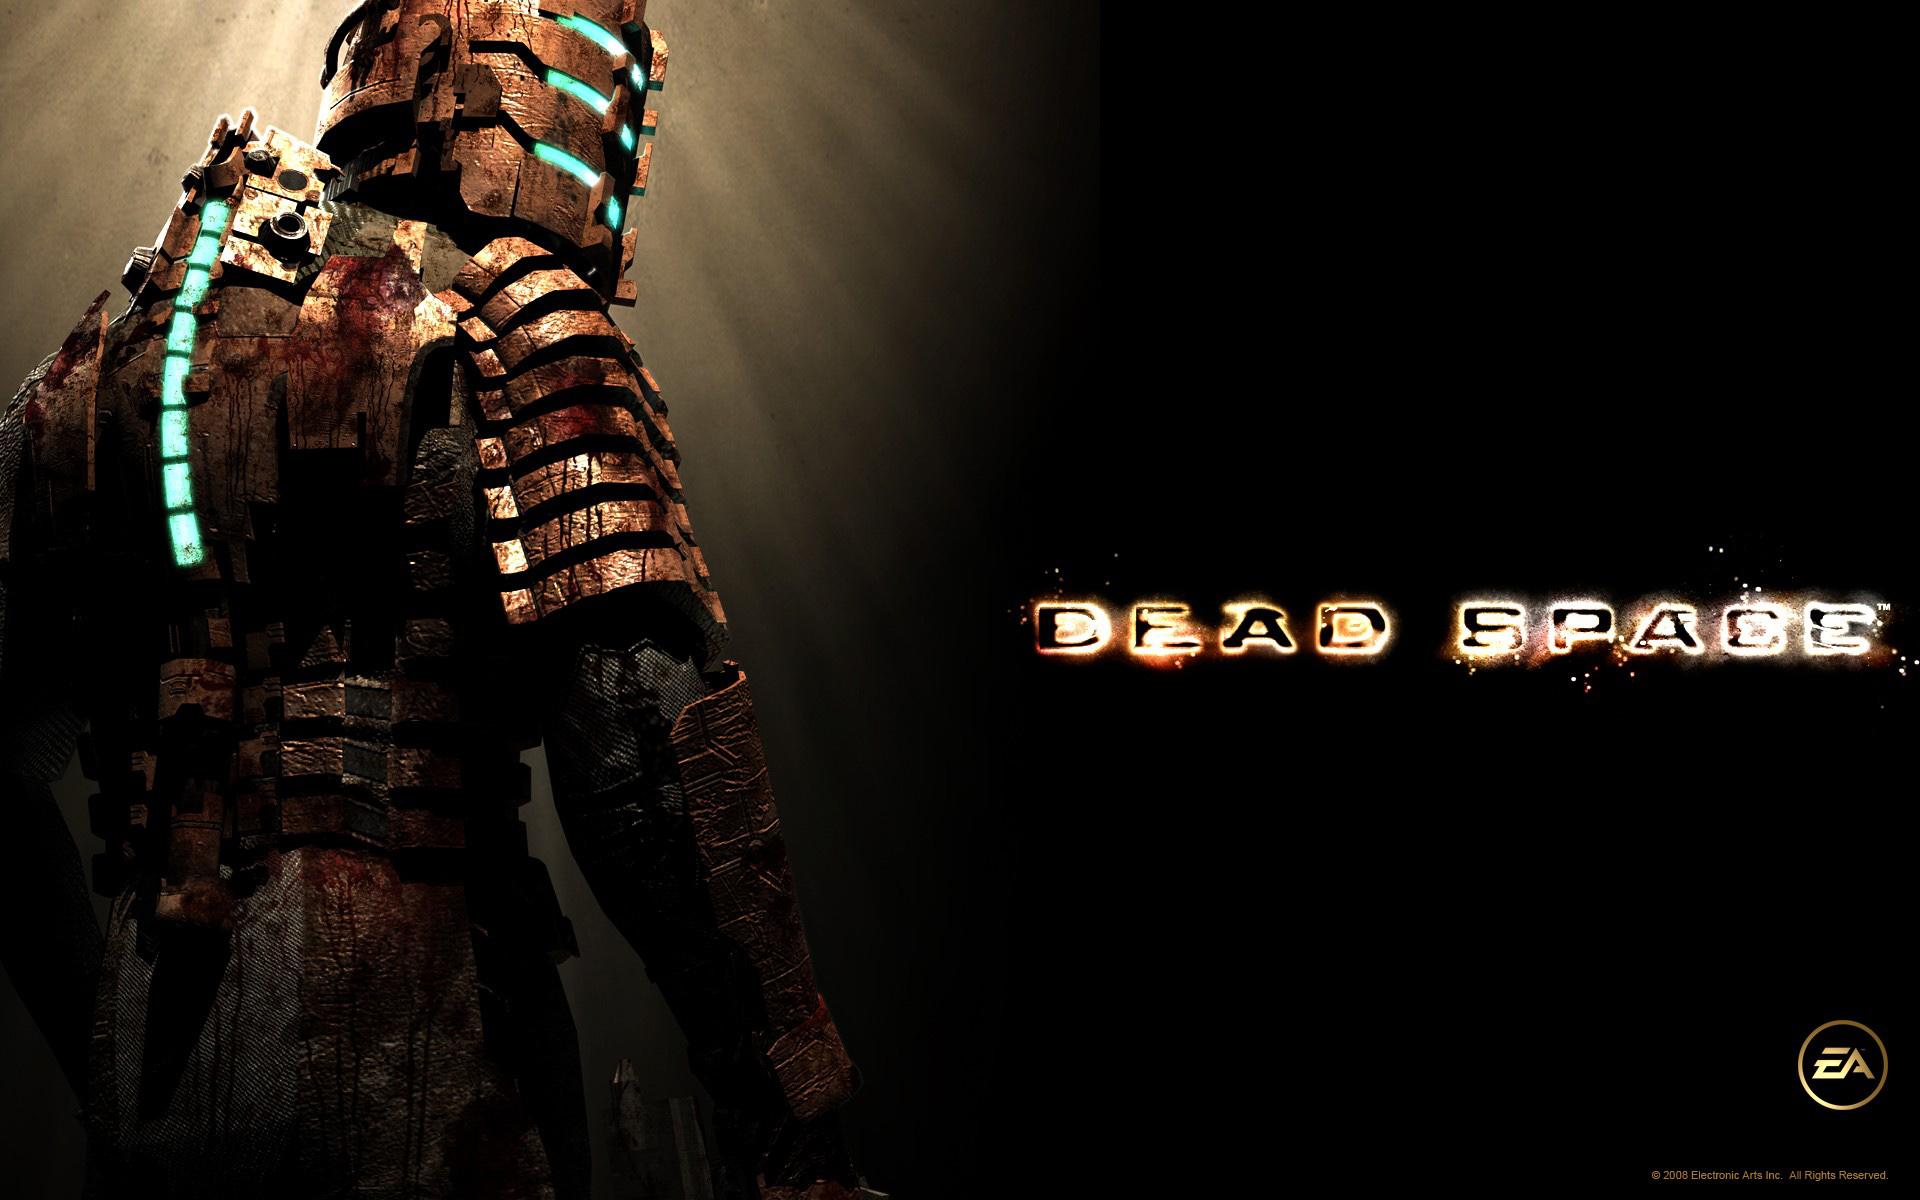 Dead Space Wallpaper Pack File Mod Db